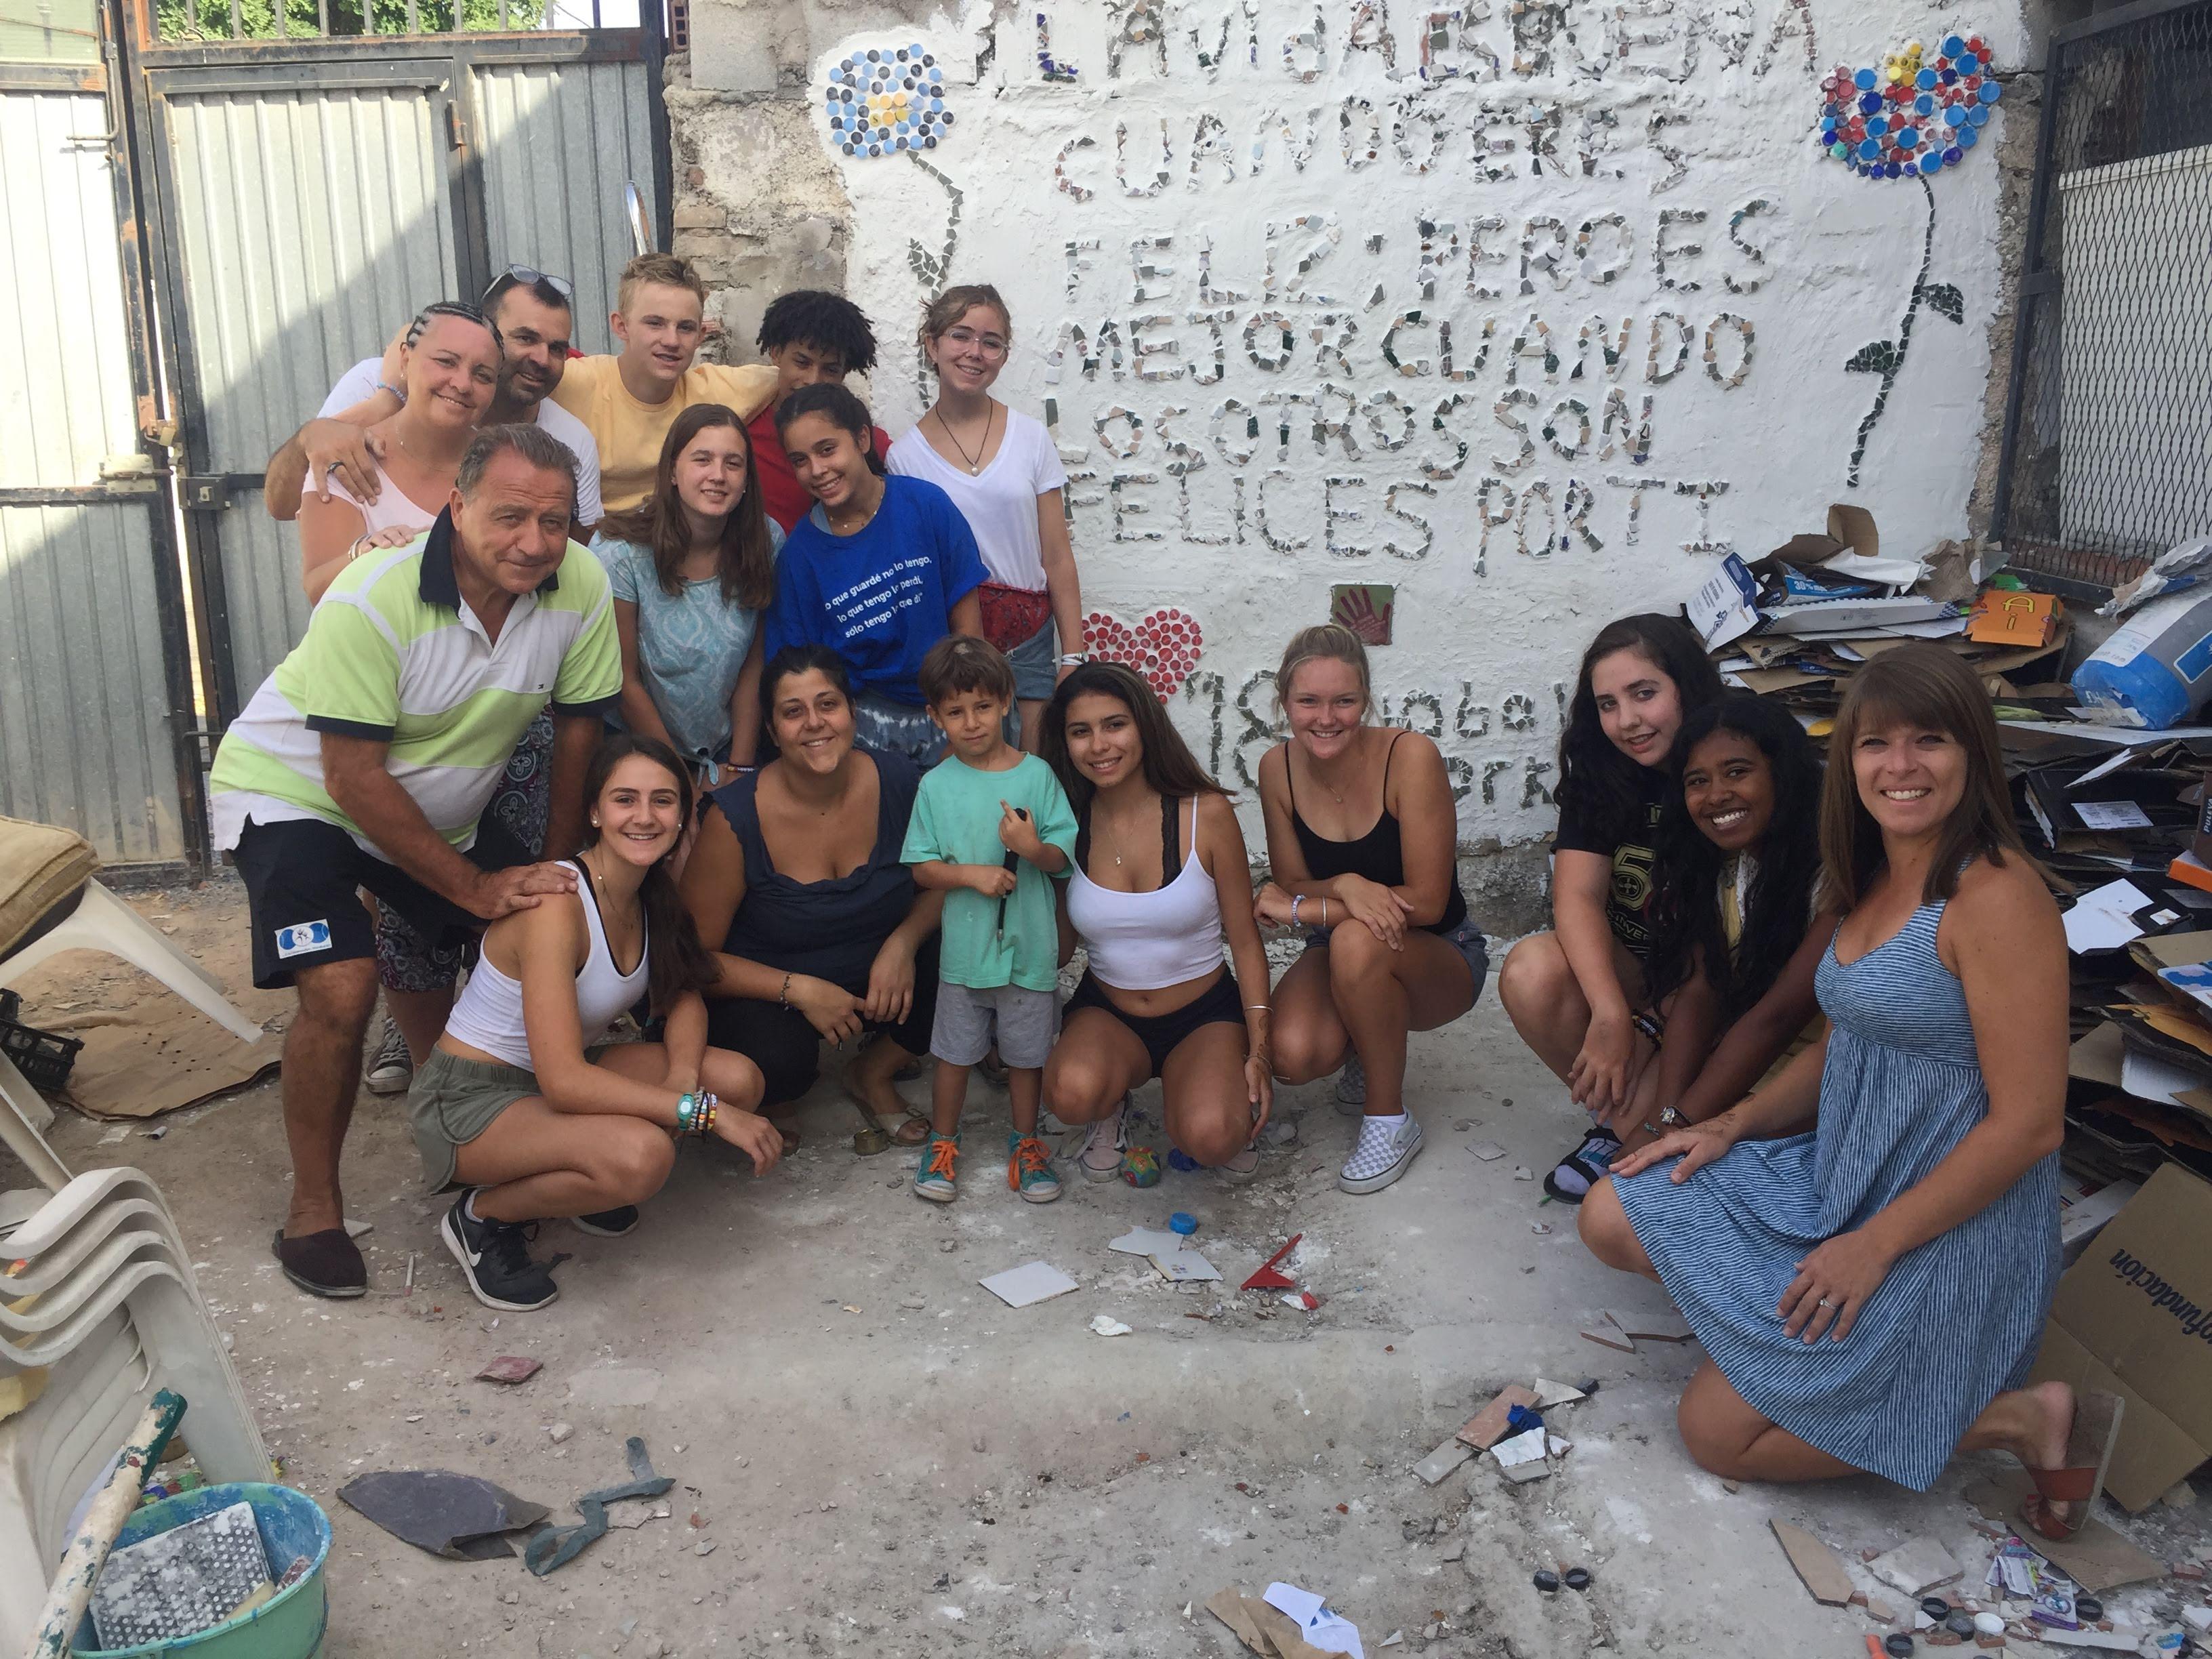 Summer Program - Community Center | Global Works - Spain: Service & Sights